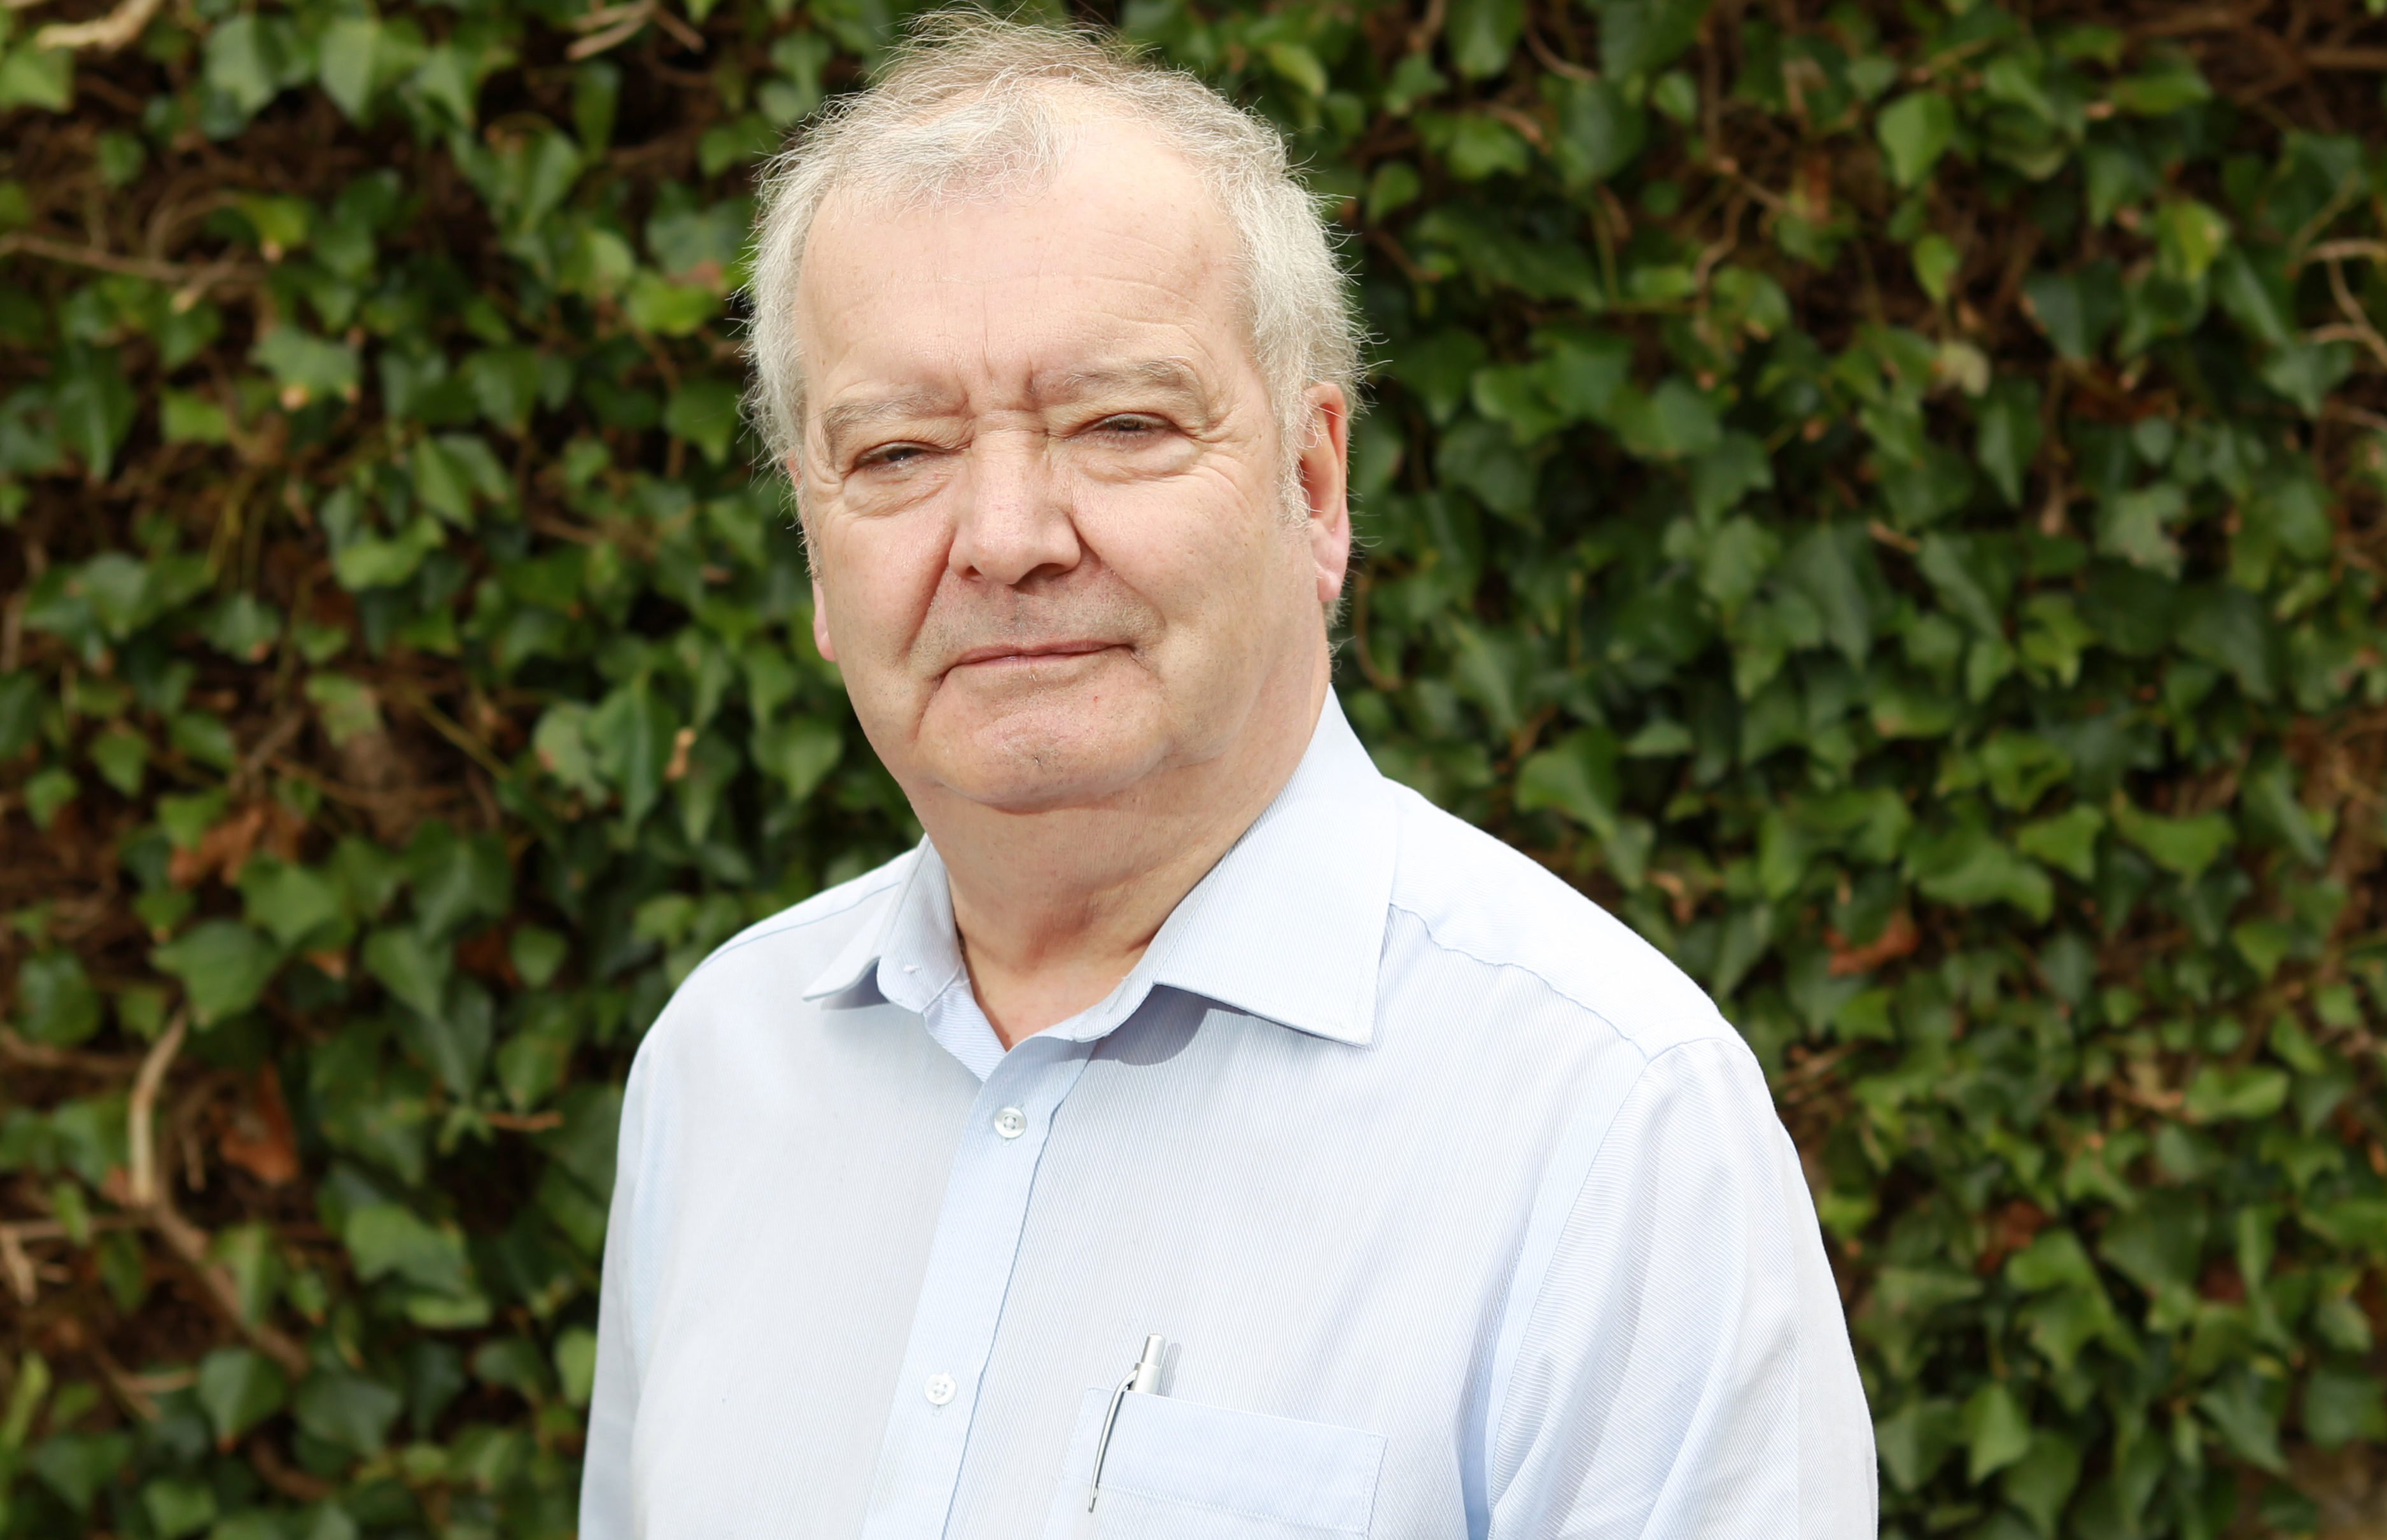 Historian Sir Tom Devine